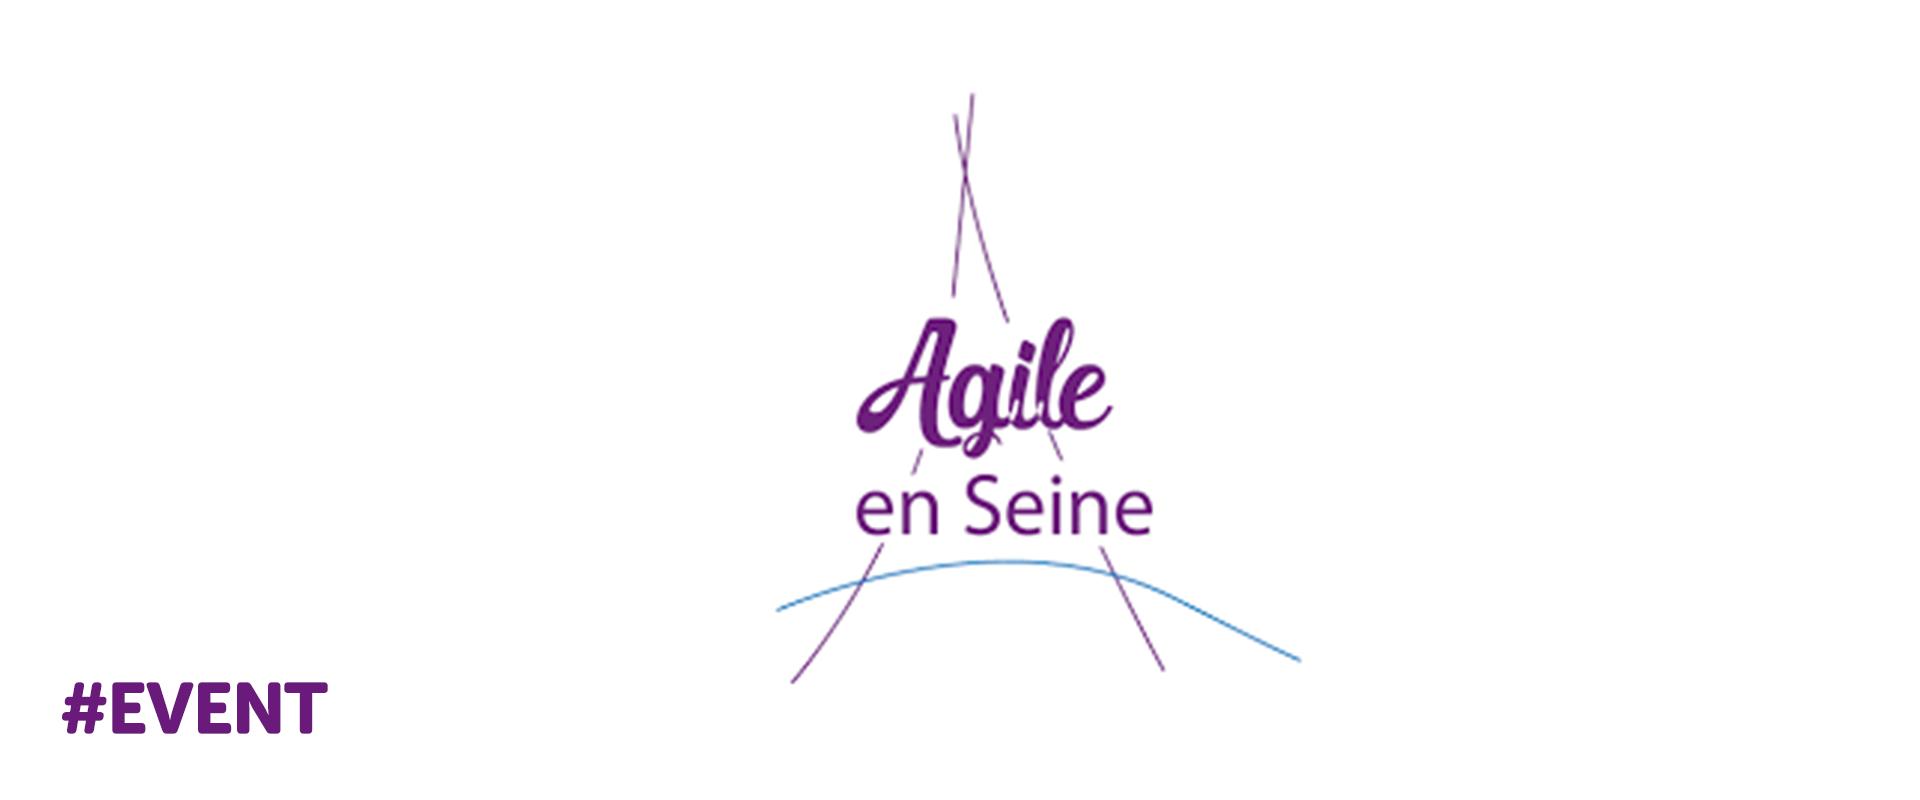 Logo Agile en Seine 2018